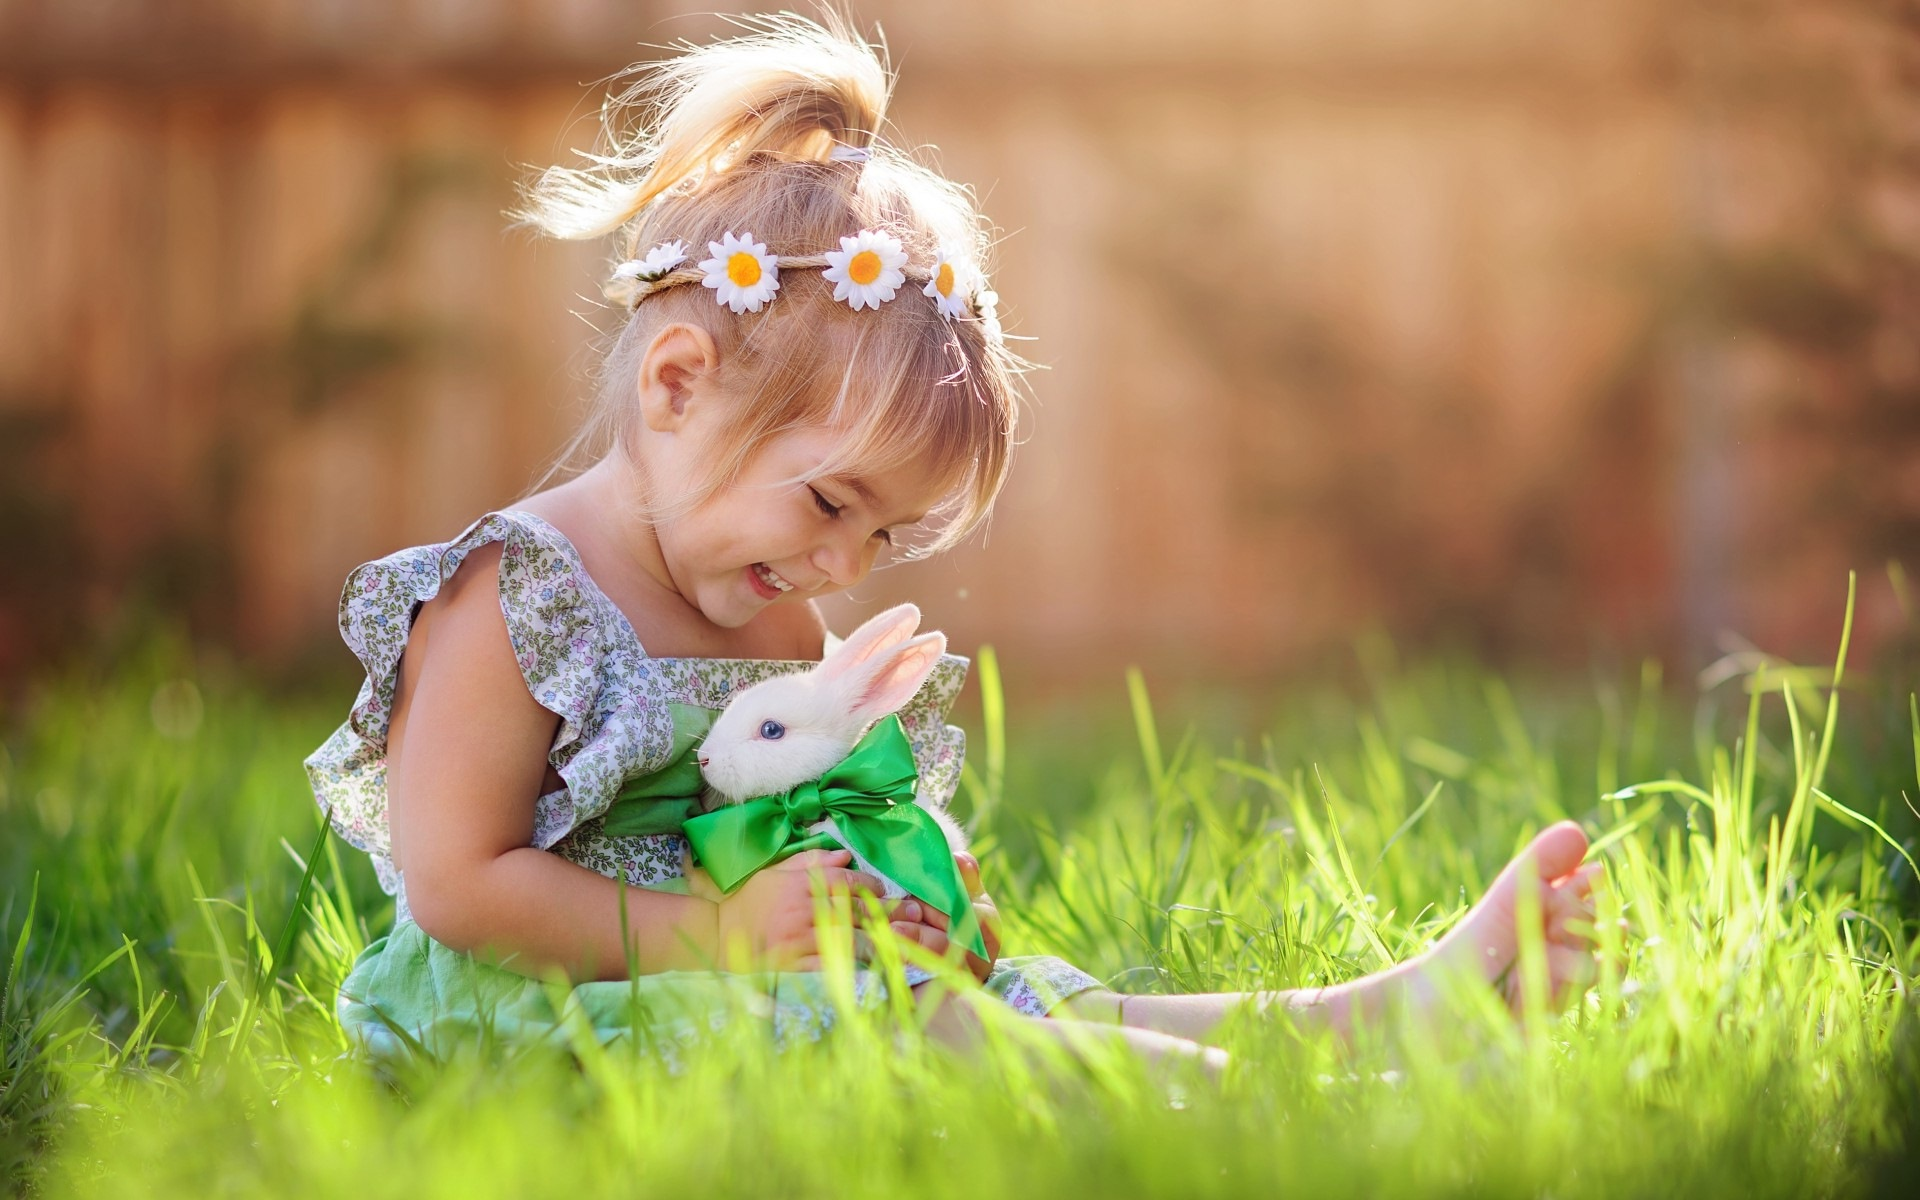 Baby Bunny Background For Desktop